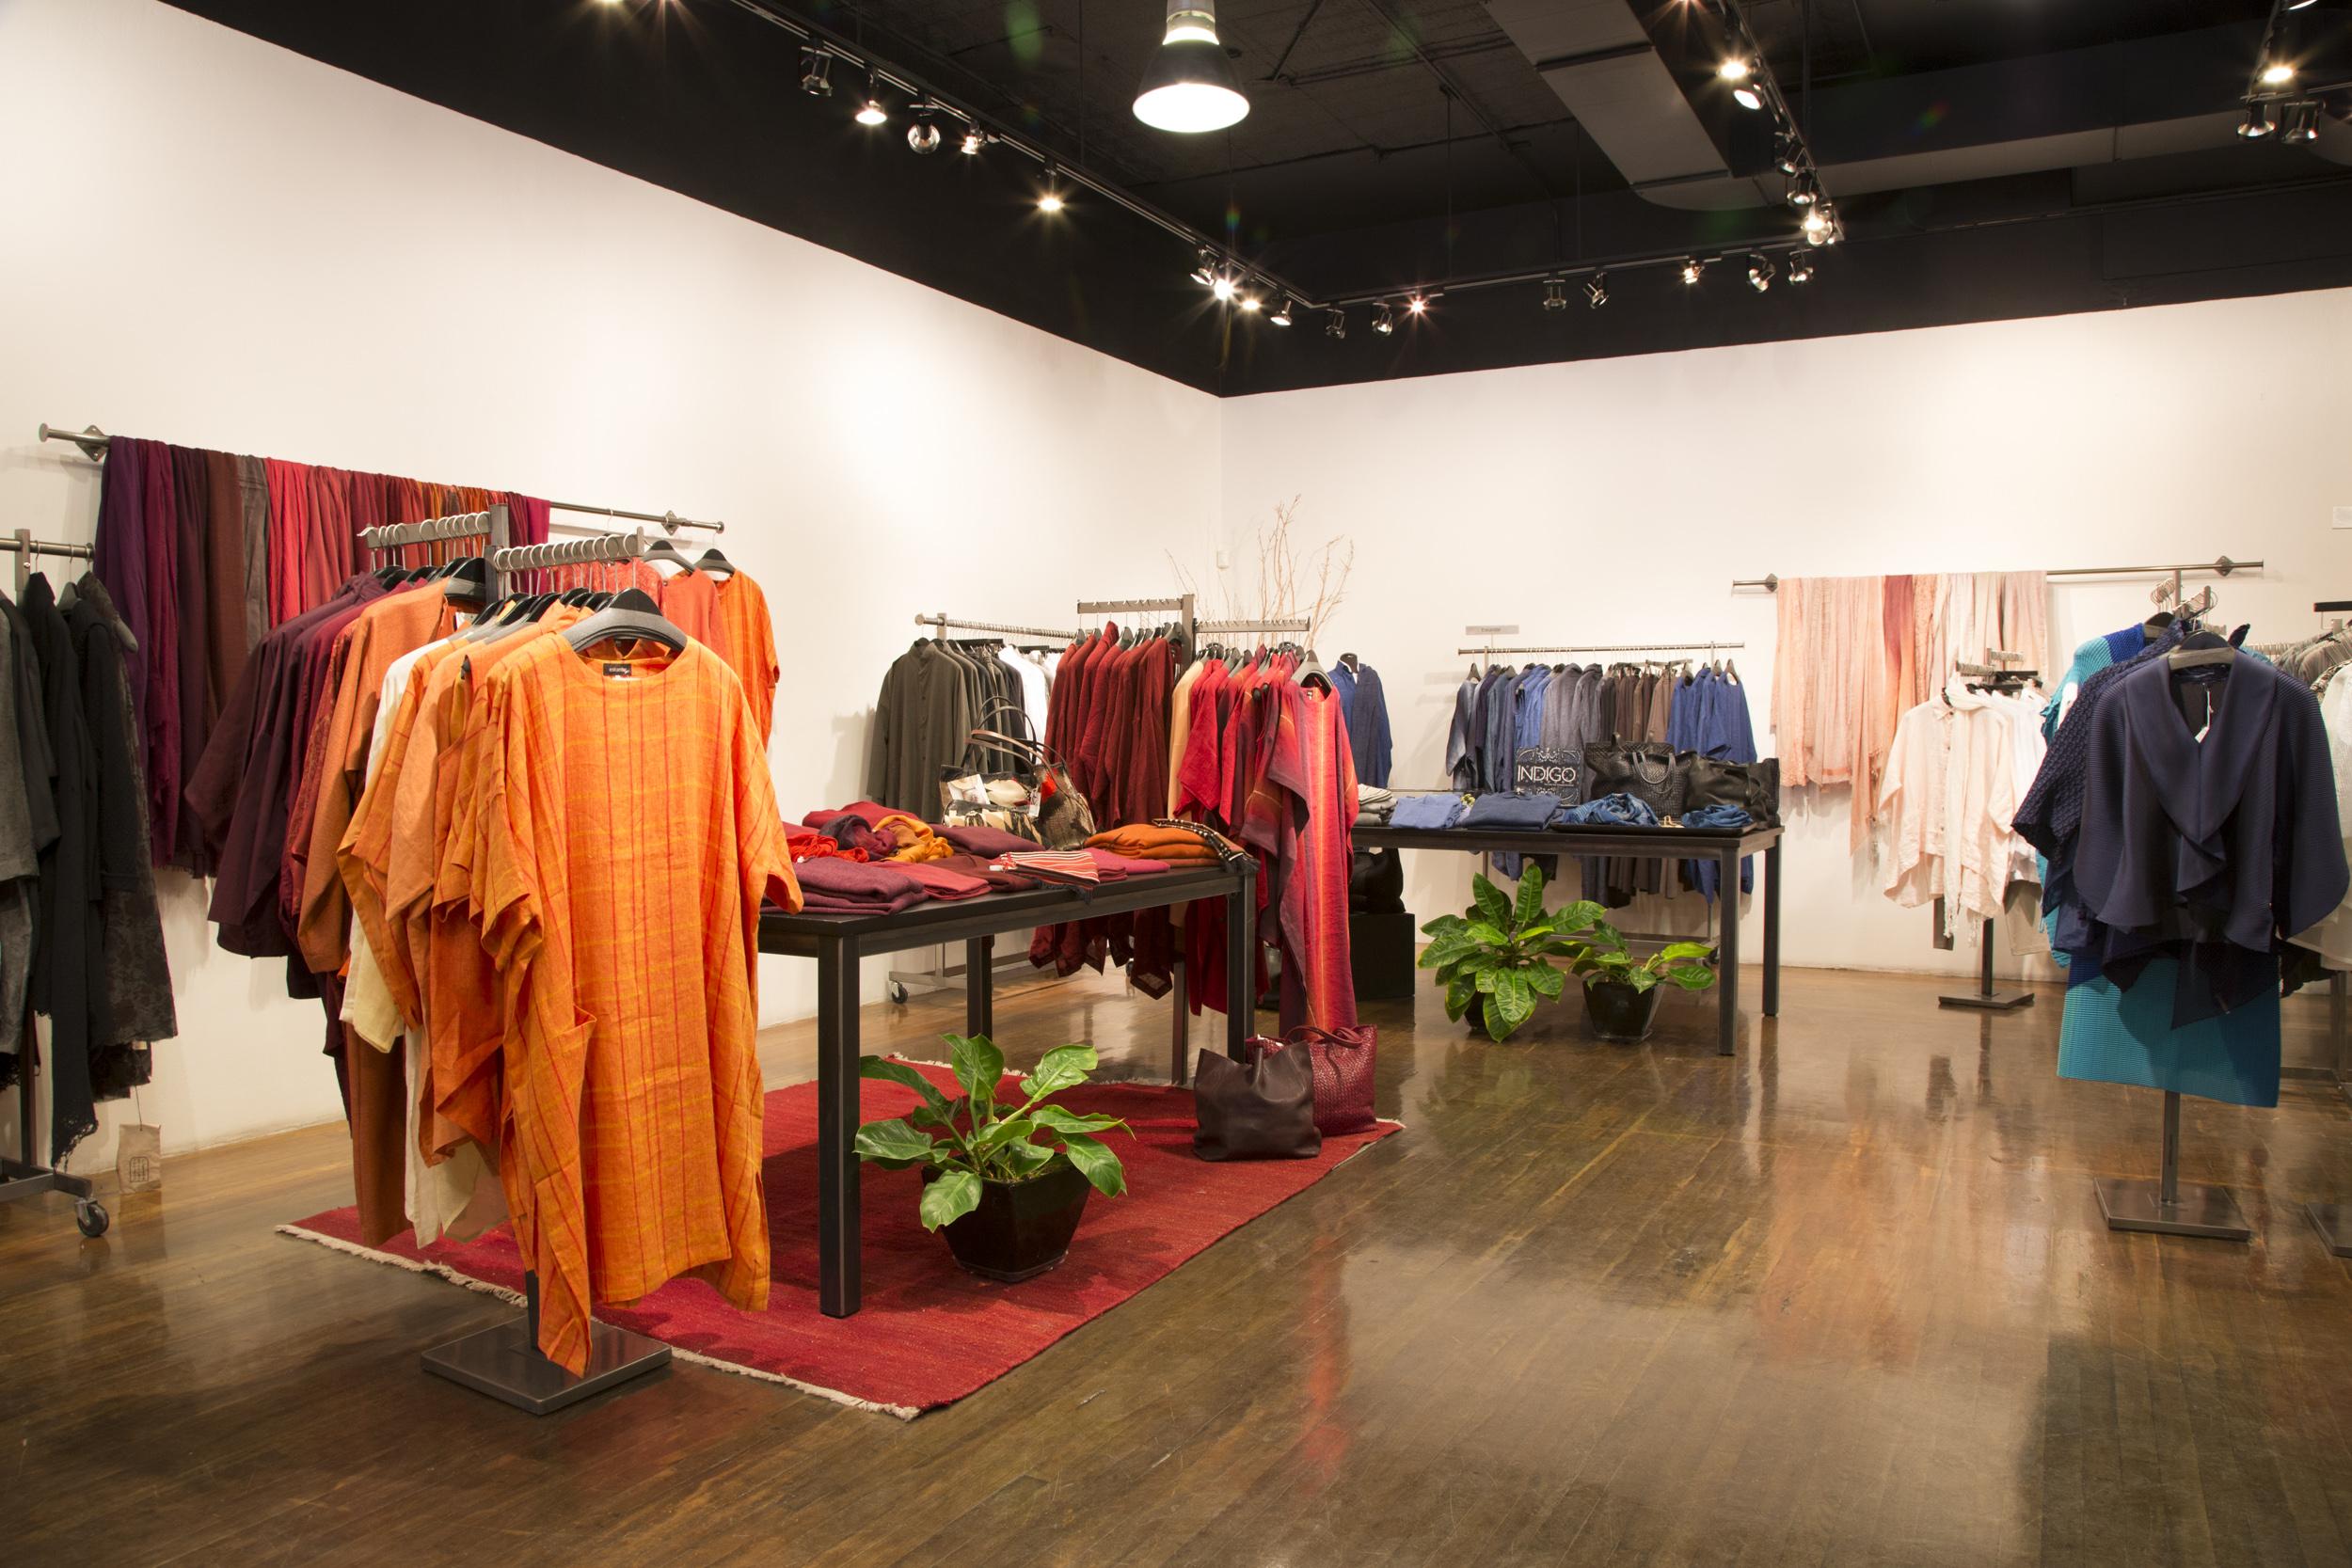 Furniture consignment stores in santa fe nm - Santa Fe Dry Goods